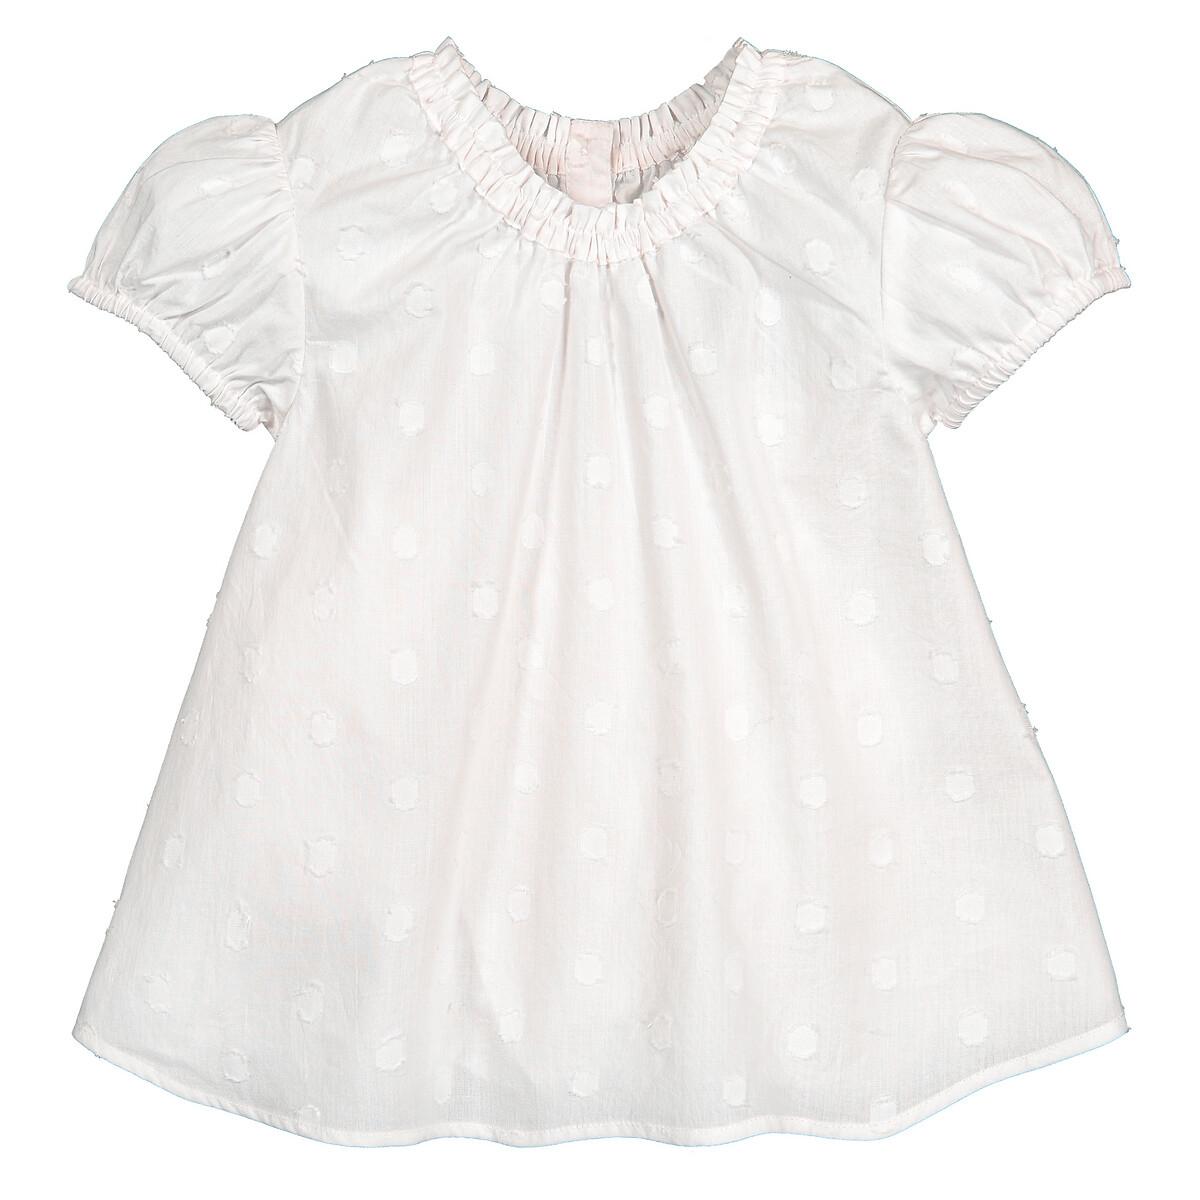 Блузка LaRedoute С короткими рукавами 3 мес-4 года 4 года - 102 см бежевый блузка laredoute с длинными рукавами и отделкой макраме 3 12 лет 4 года 102 см бежевый